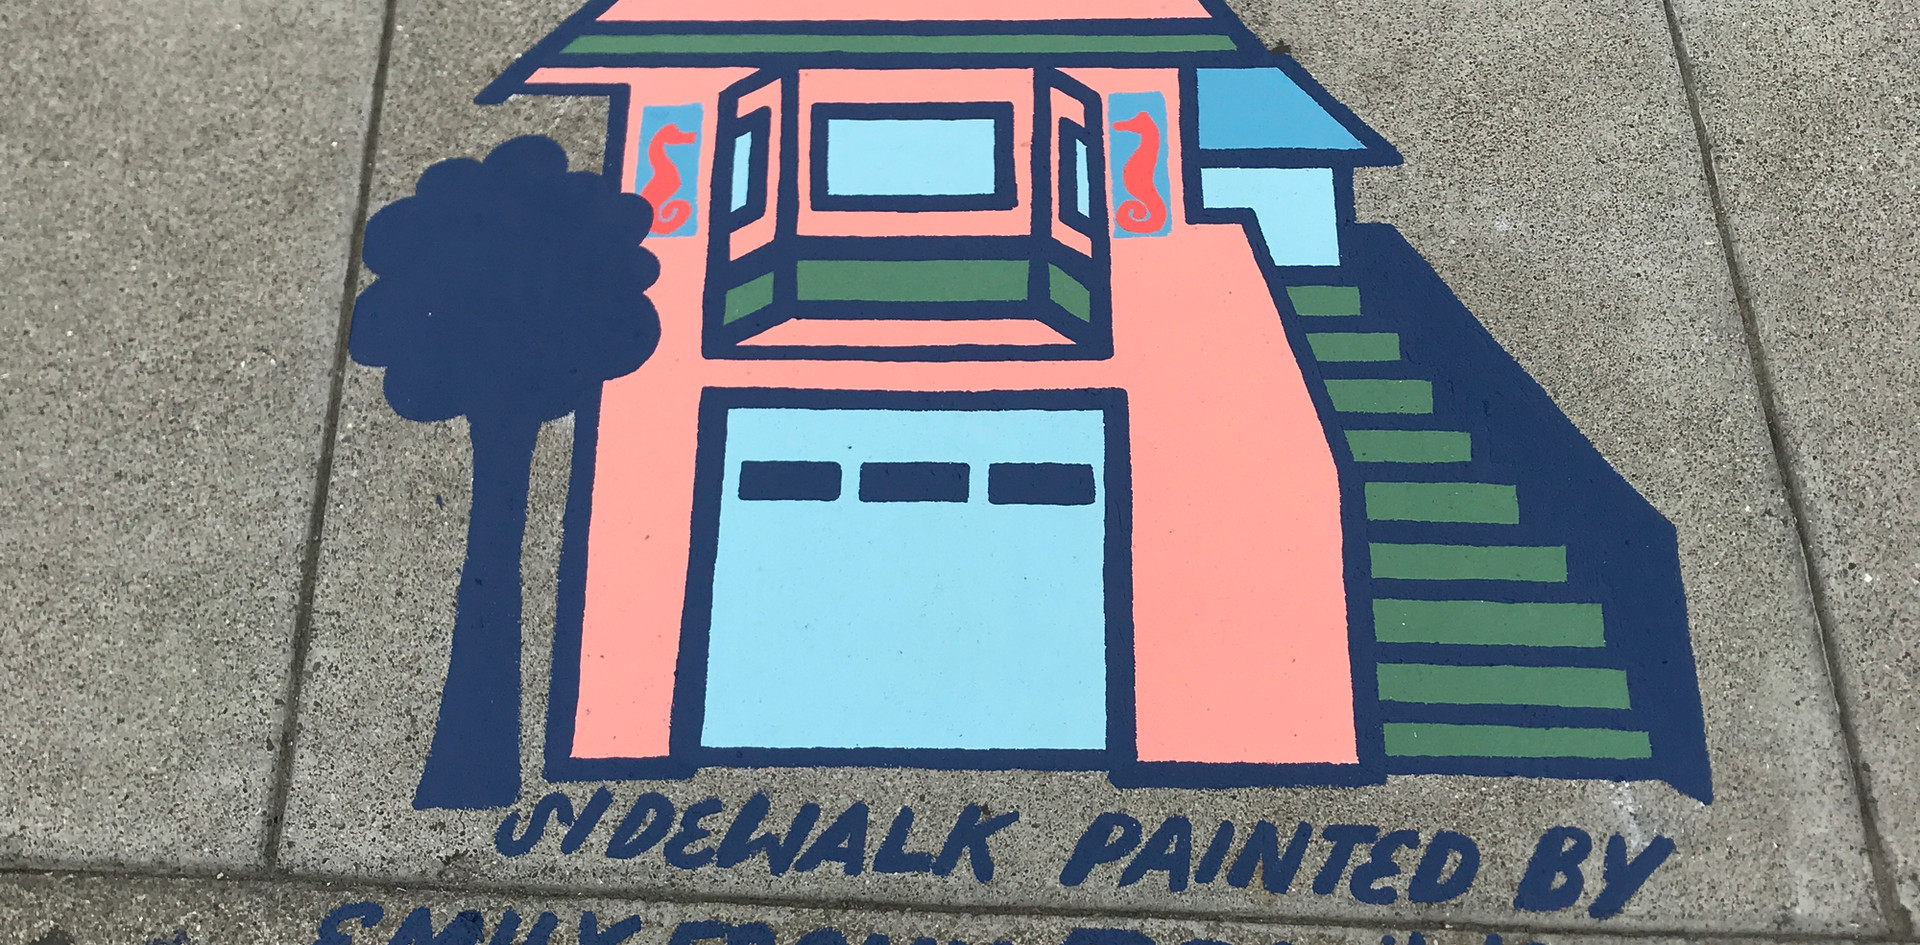 JAVA BEACH SIDEWALK ART